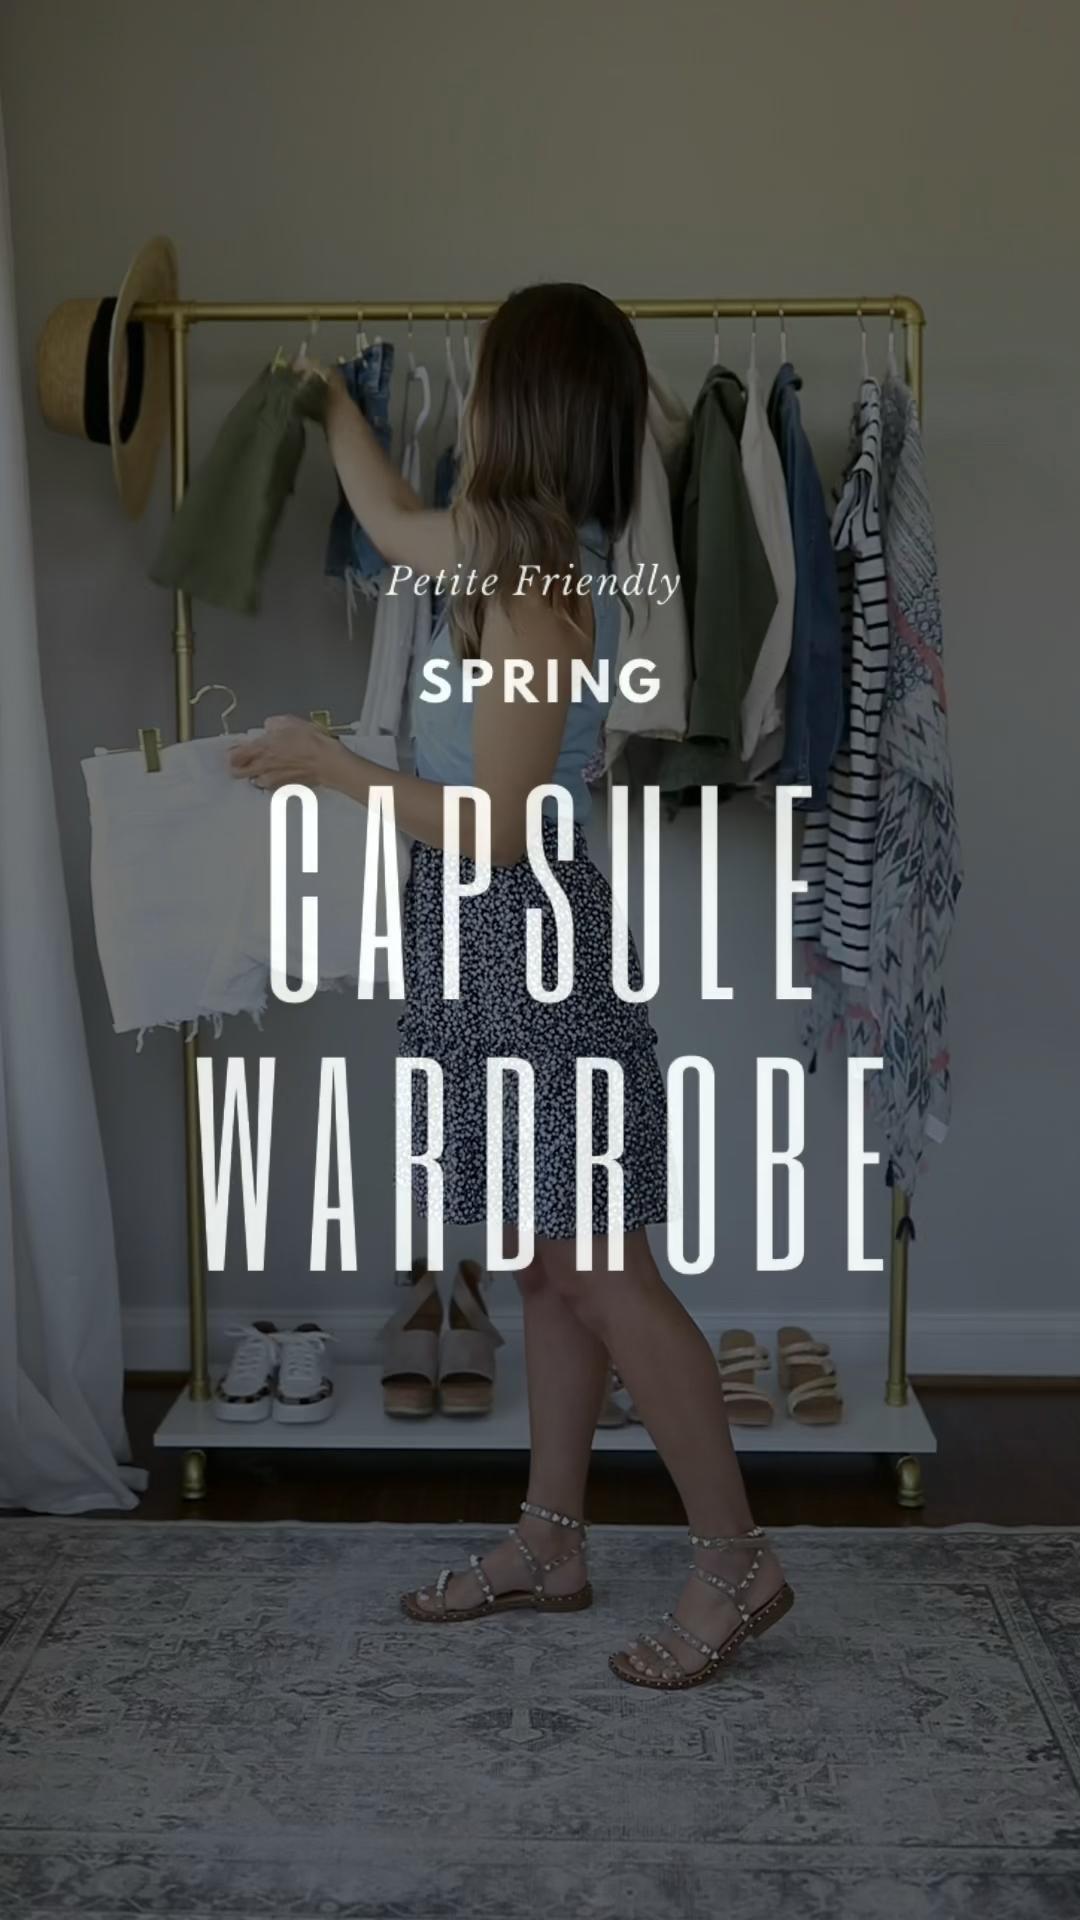 Petite Friendly Spring Capsule Wardrobe